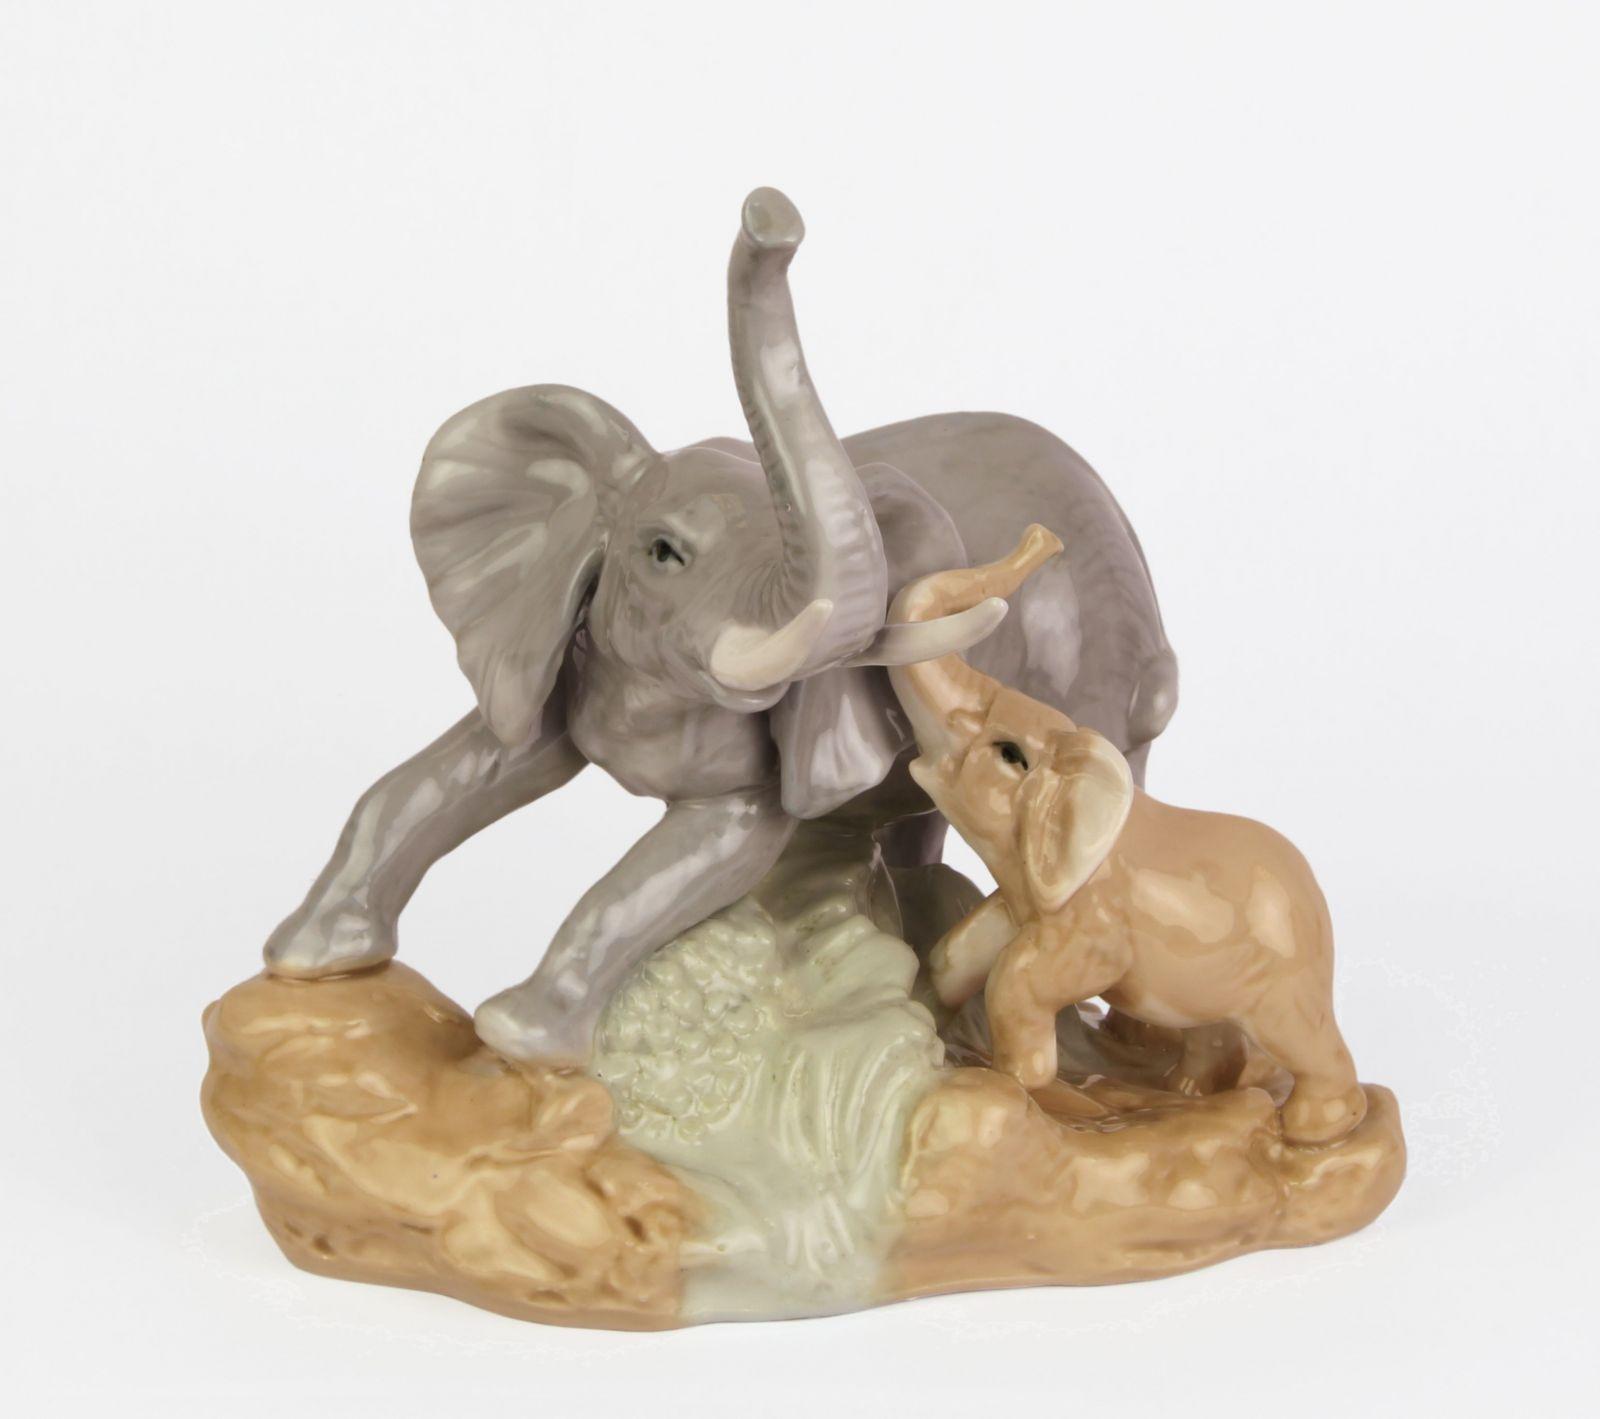 Статуэтка слонихи со слоненком из фарфора BrokInCZ